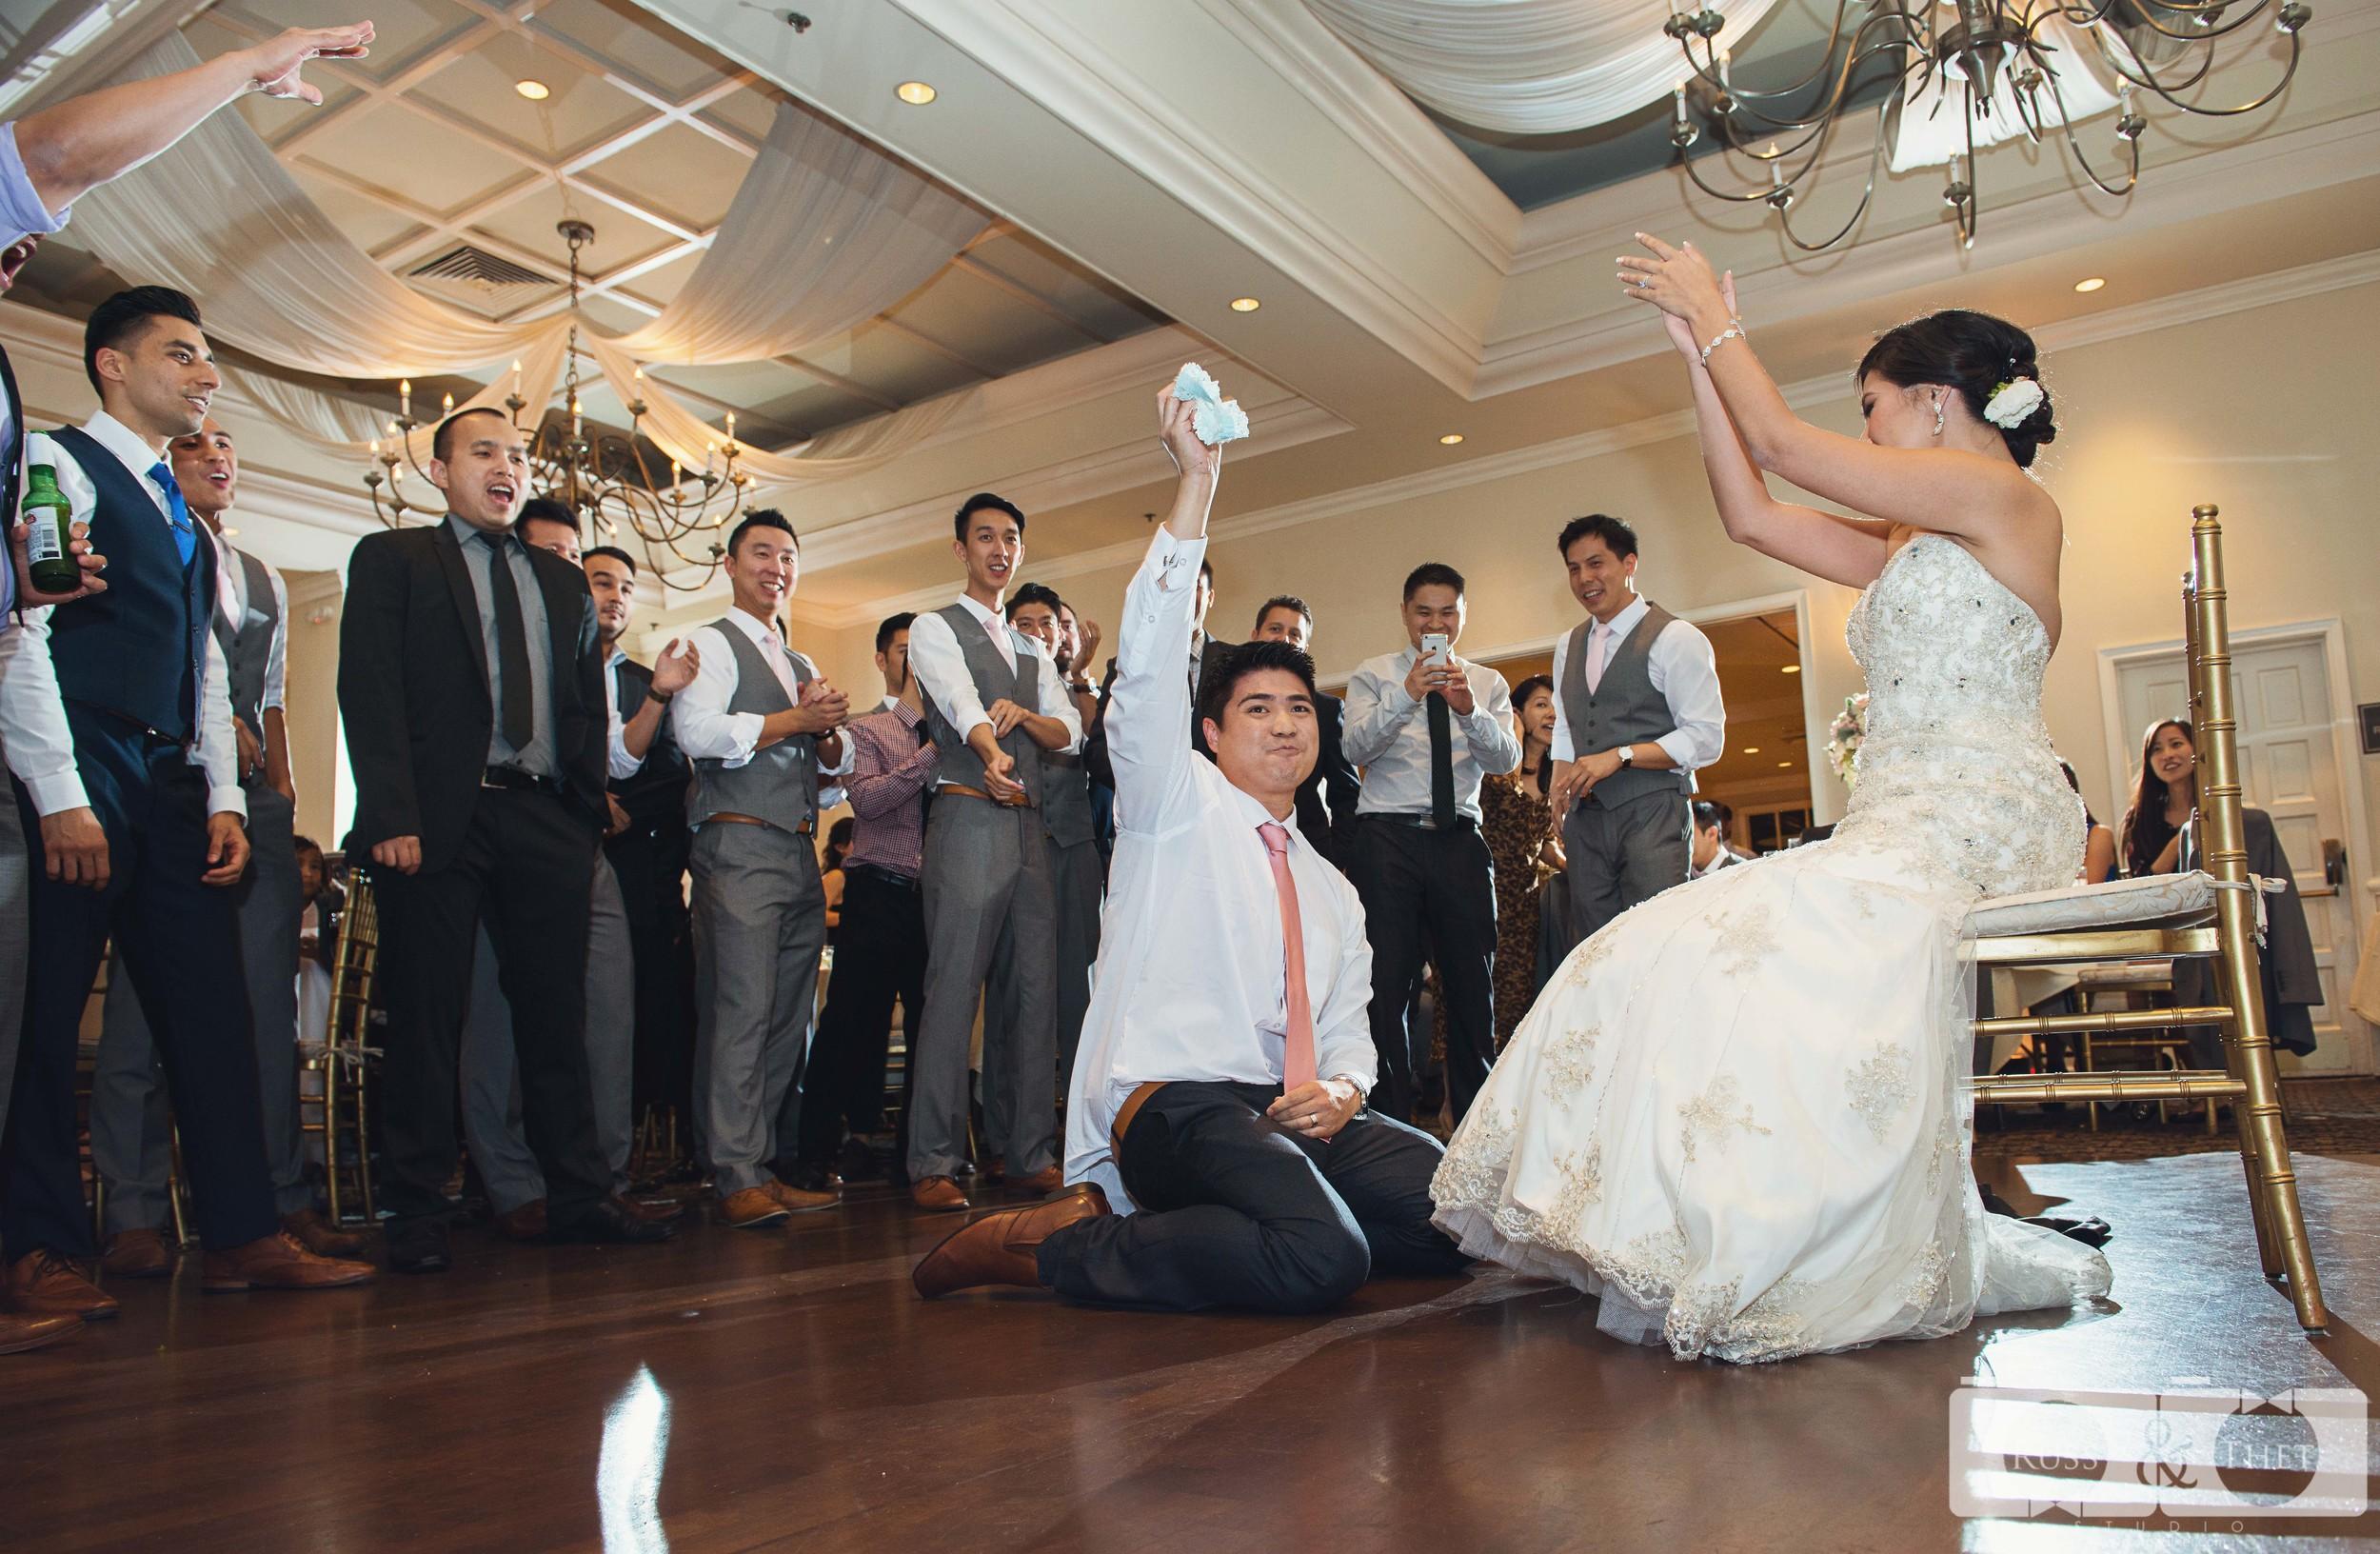 summit-house-fullerton-wedding-photographer-132.JPG